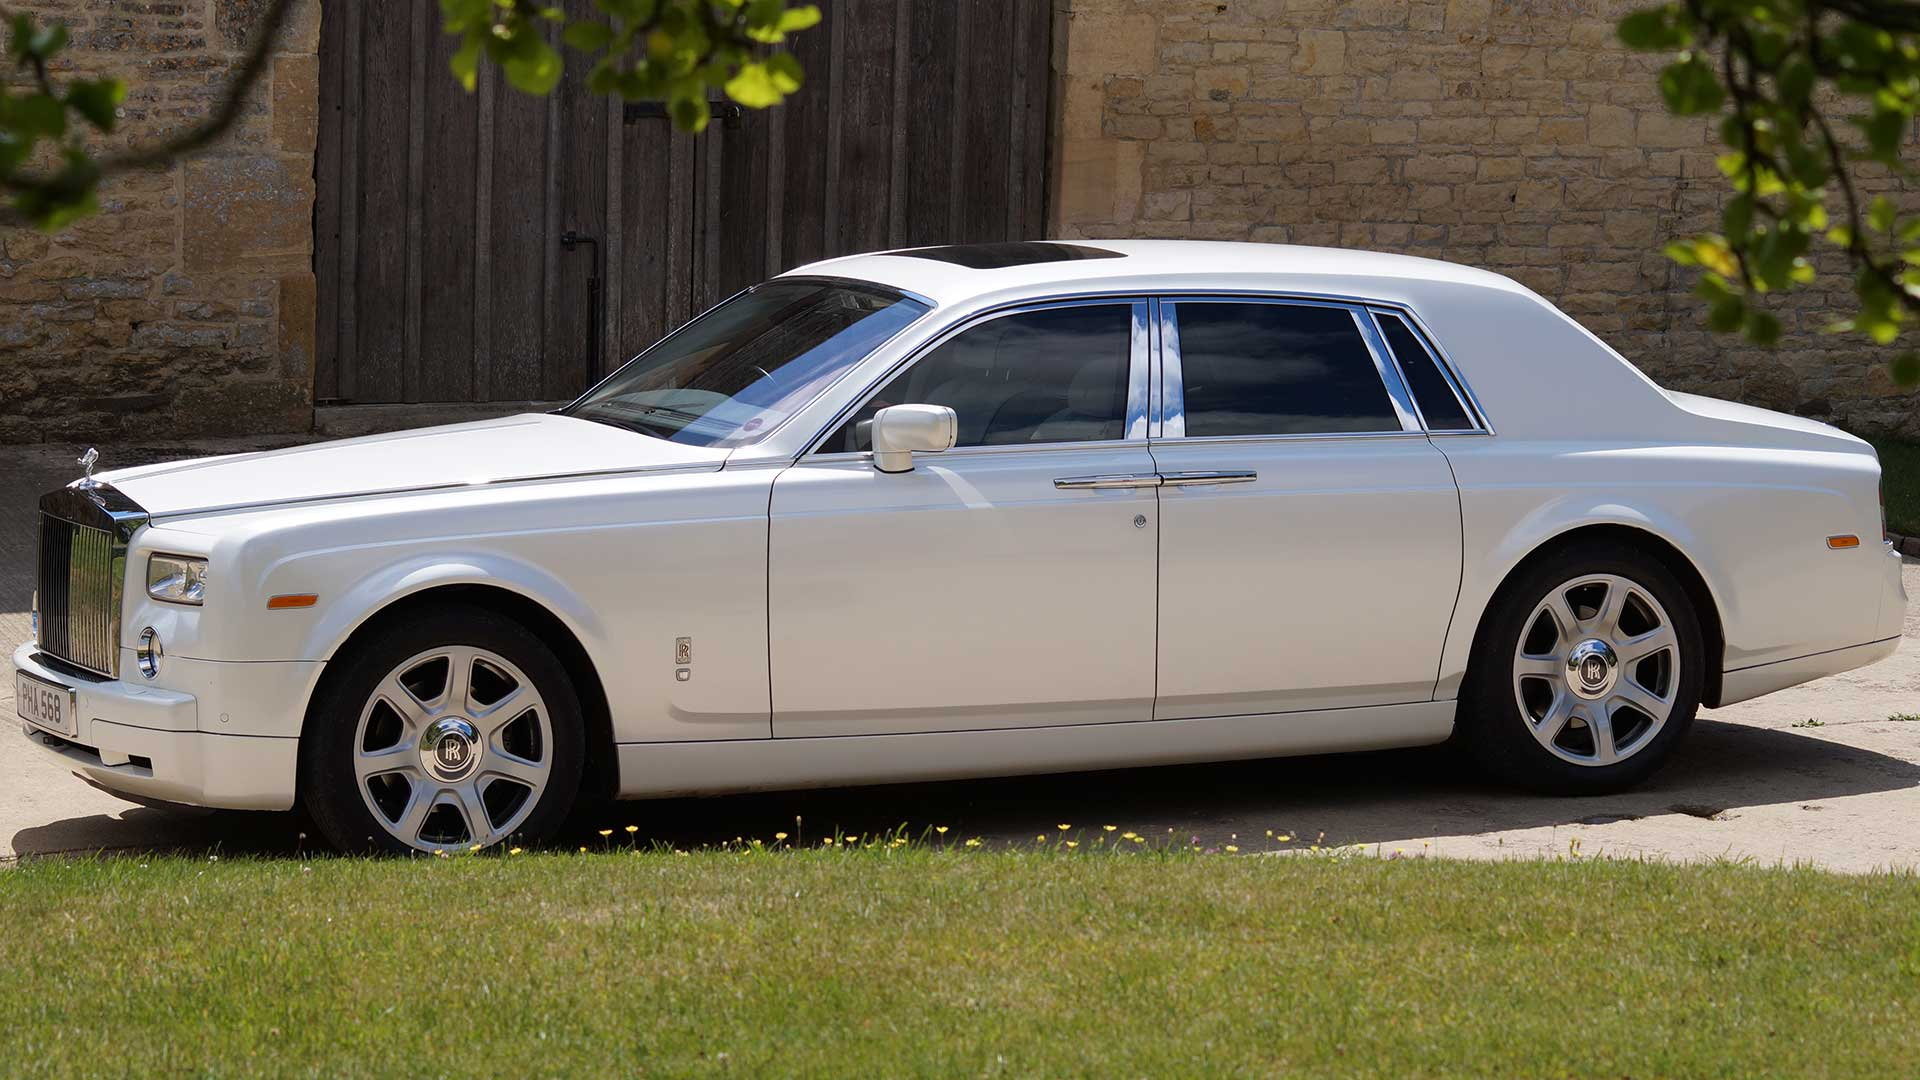 Rolls-Royce Phantom in Pearlescent White